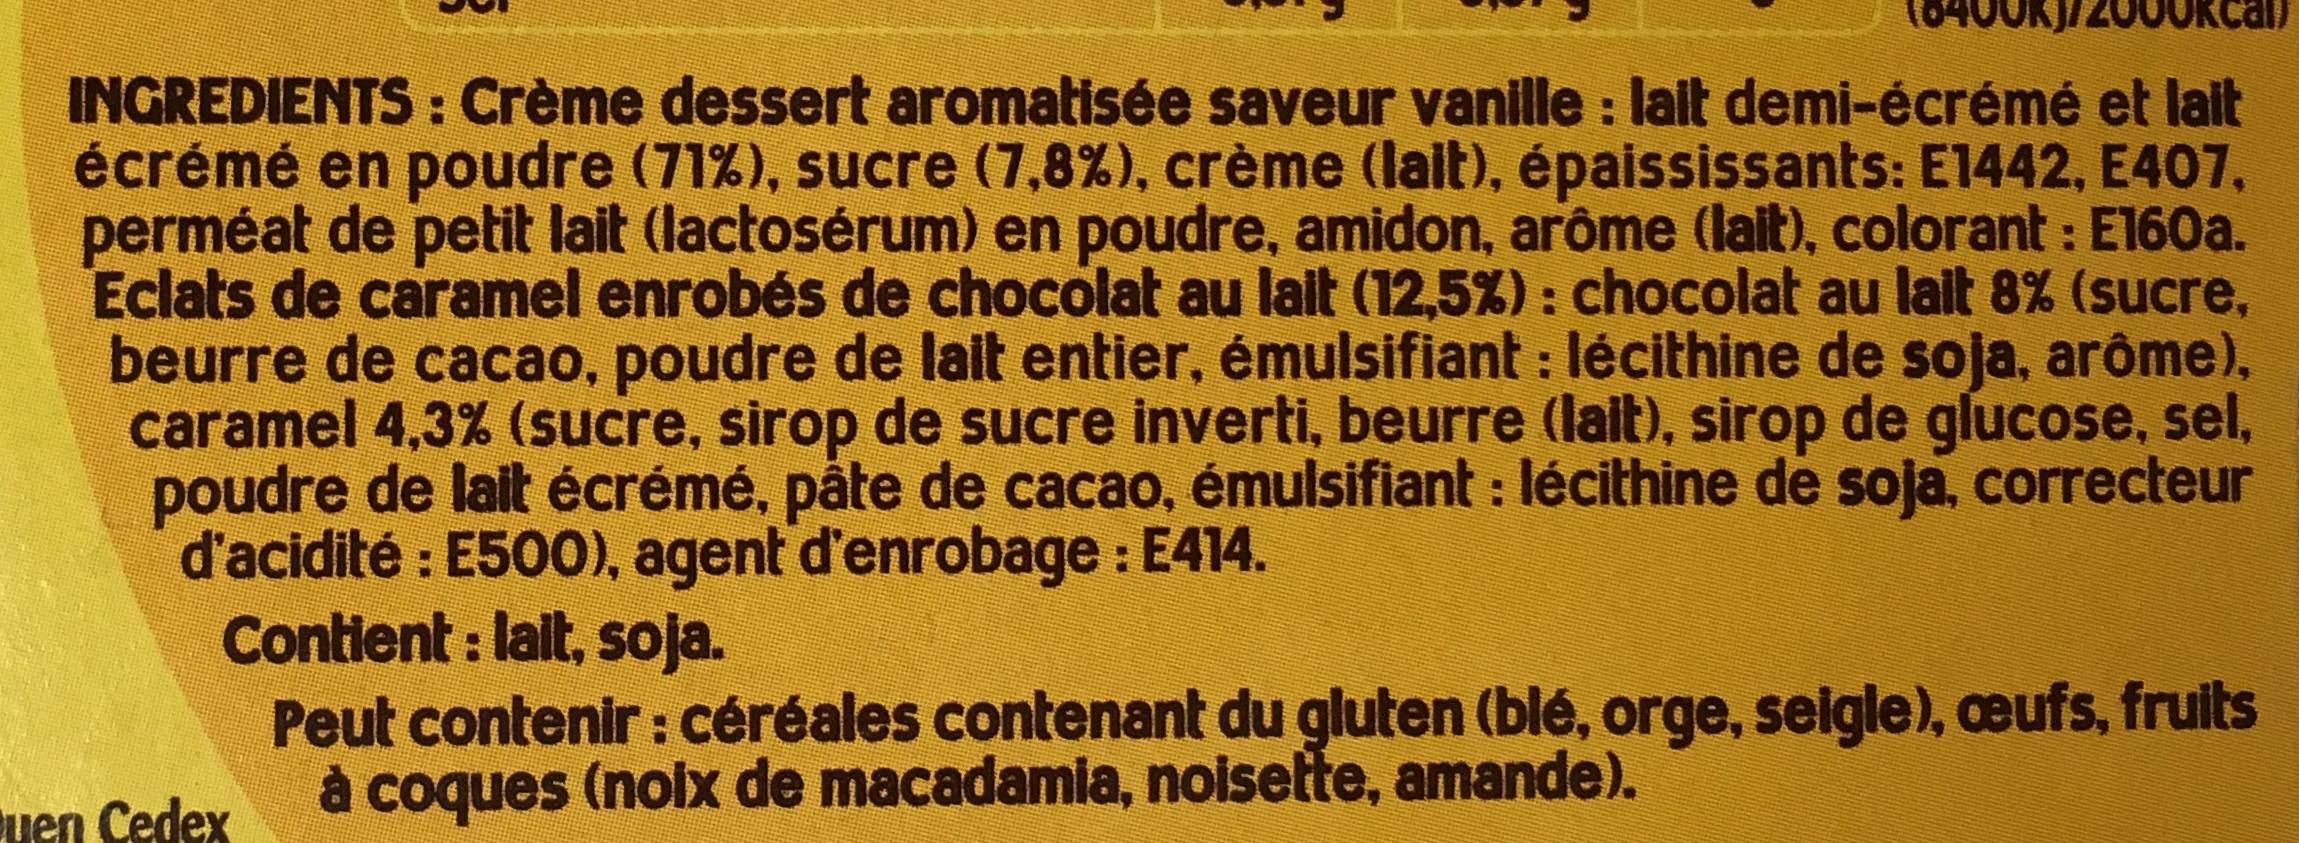 Danette Pop saveur Vanille Billes Choco Caramel Salé - Ingredienti - fr